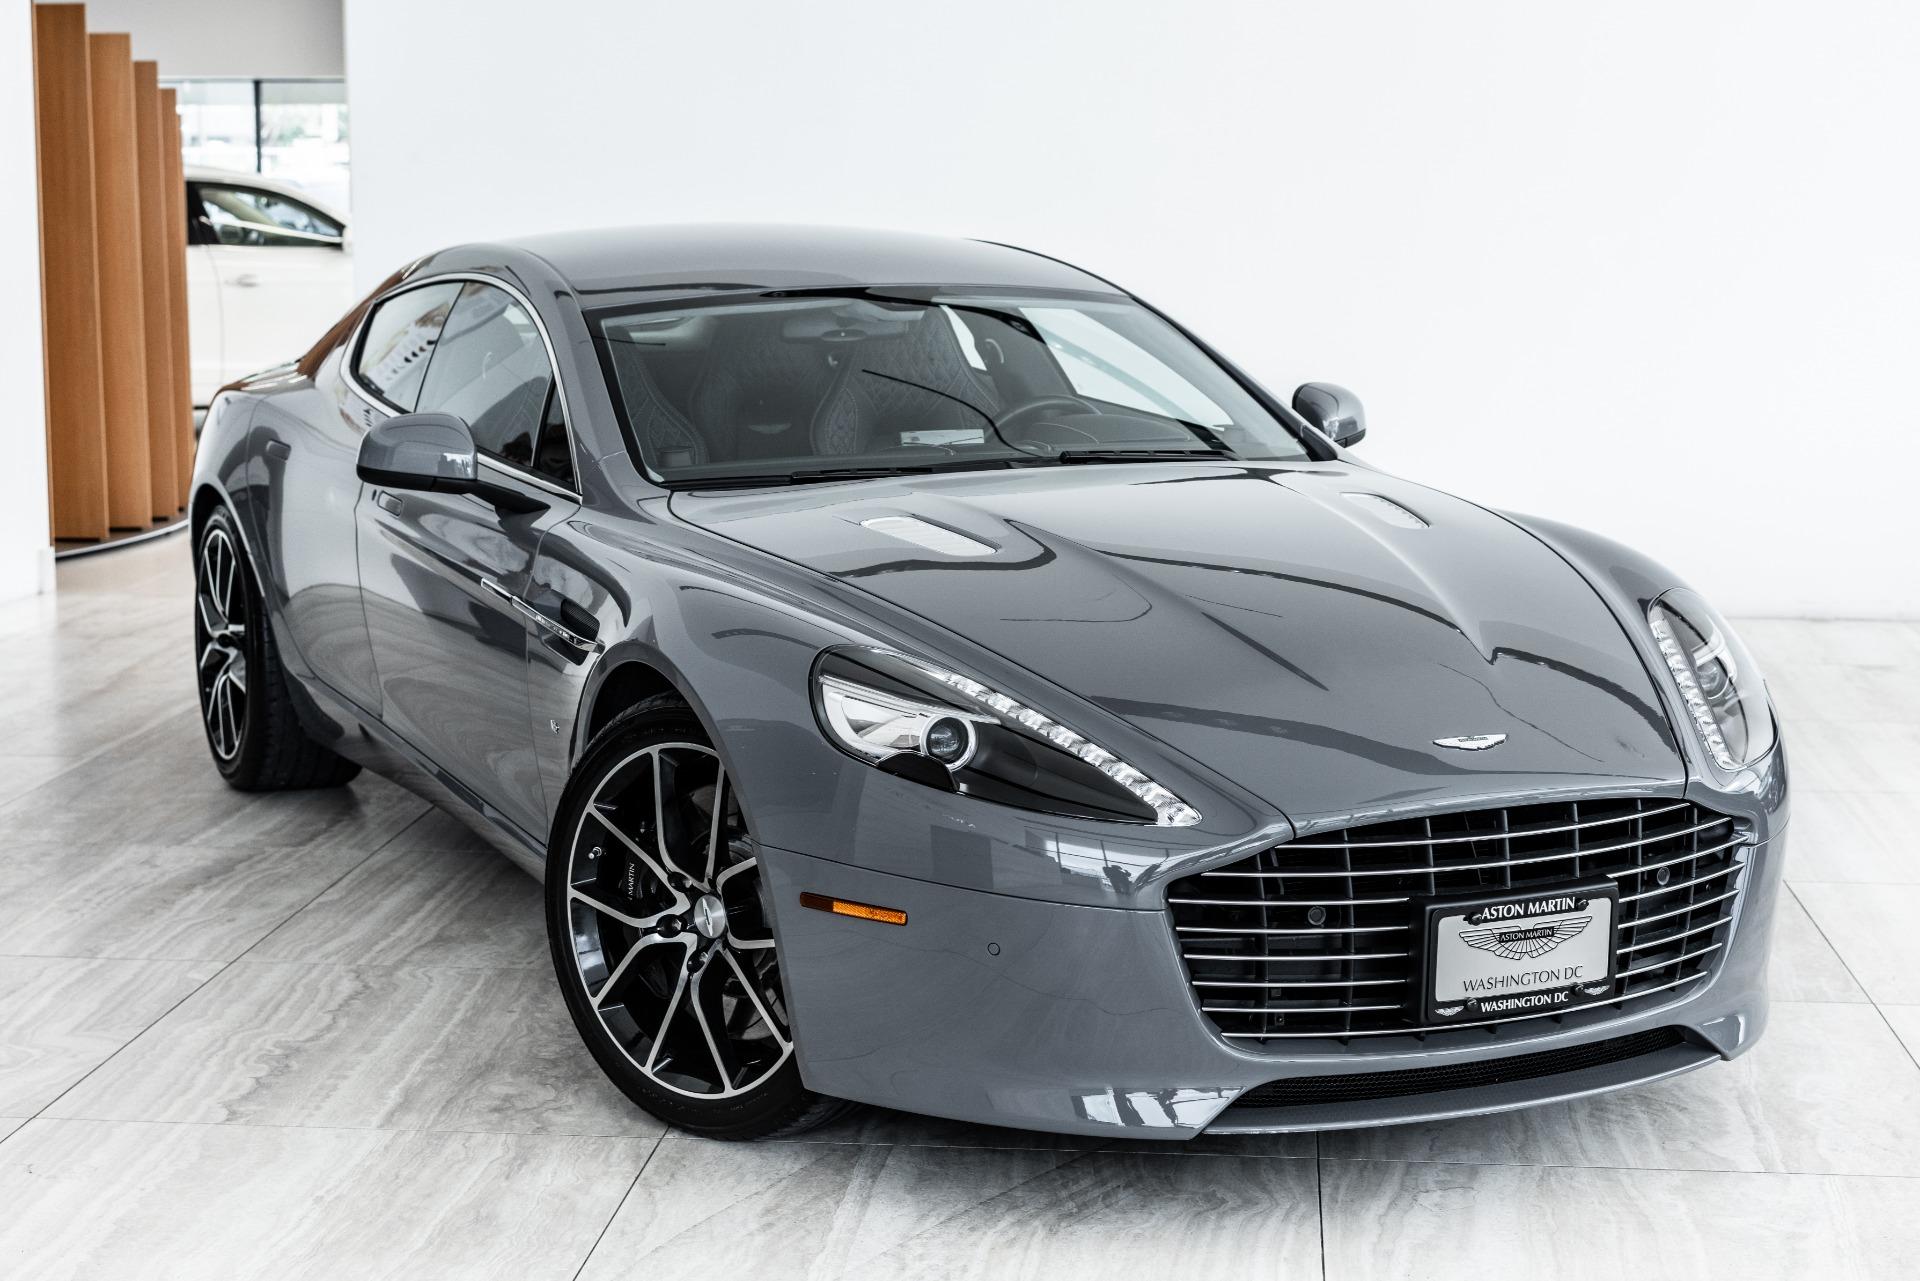 2016 Aston Martin Rapide S Stock 7nc061787a For Sale Near Vienna Va Va Aston Martin Dealer For Sale In Vienna Va 7nc061787a Exclusive Automotive Group